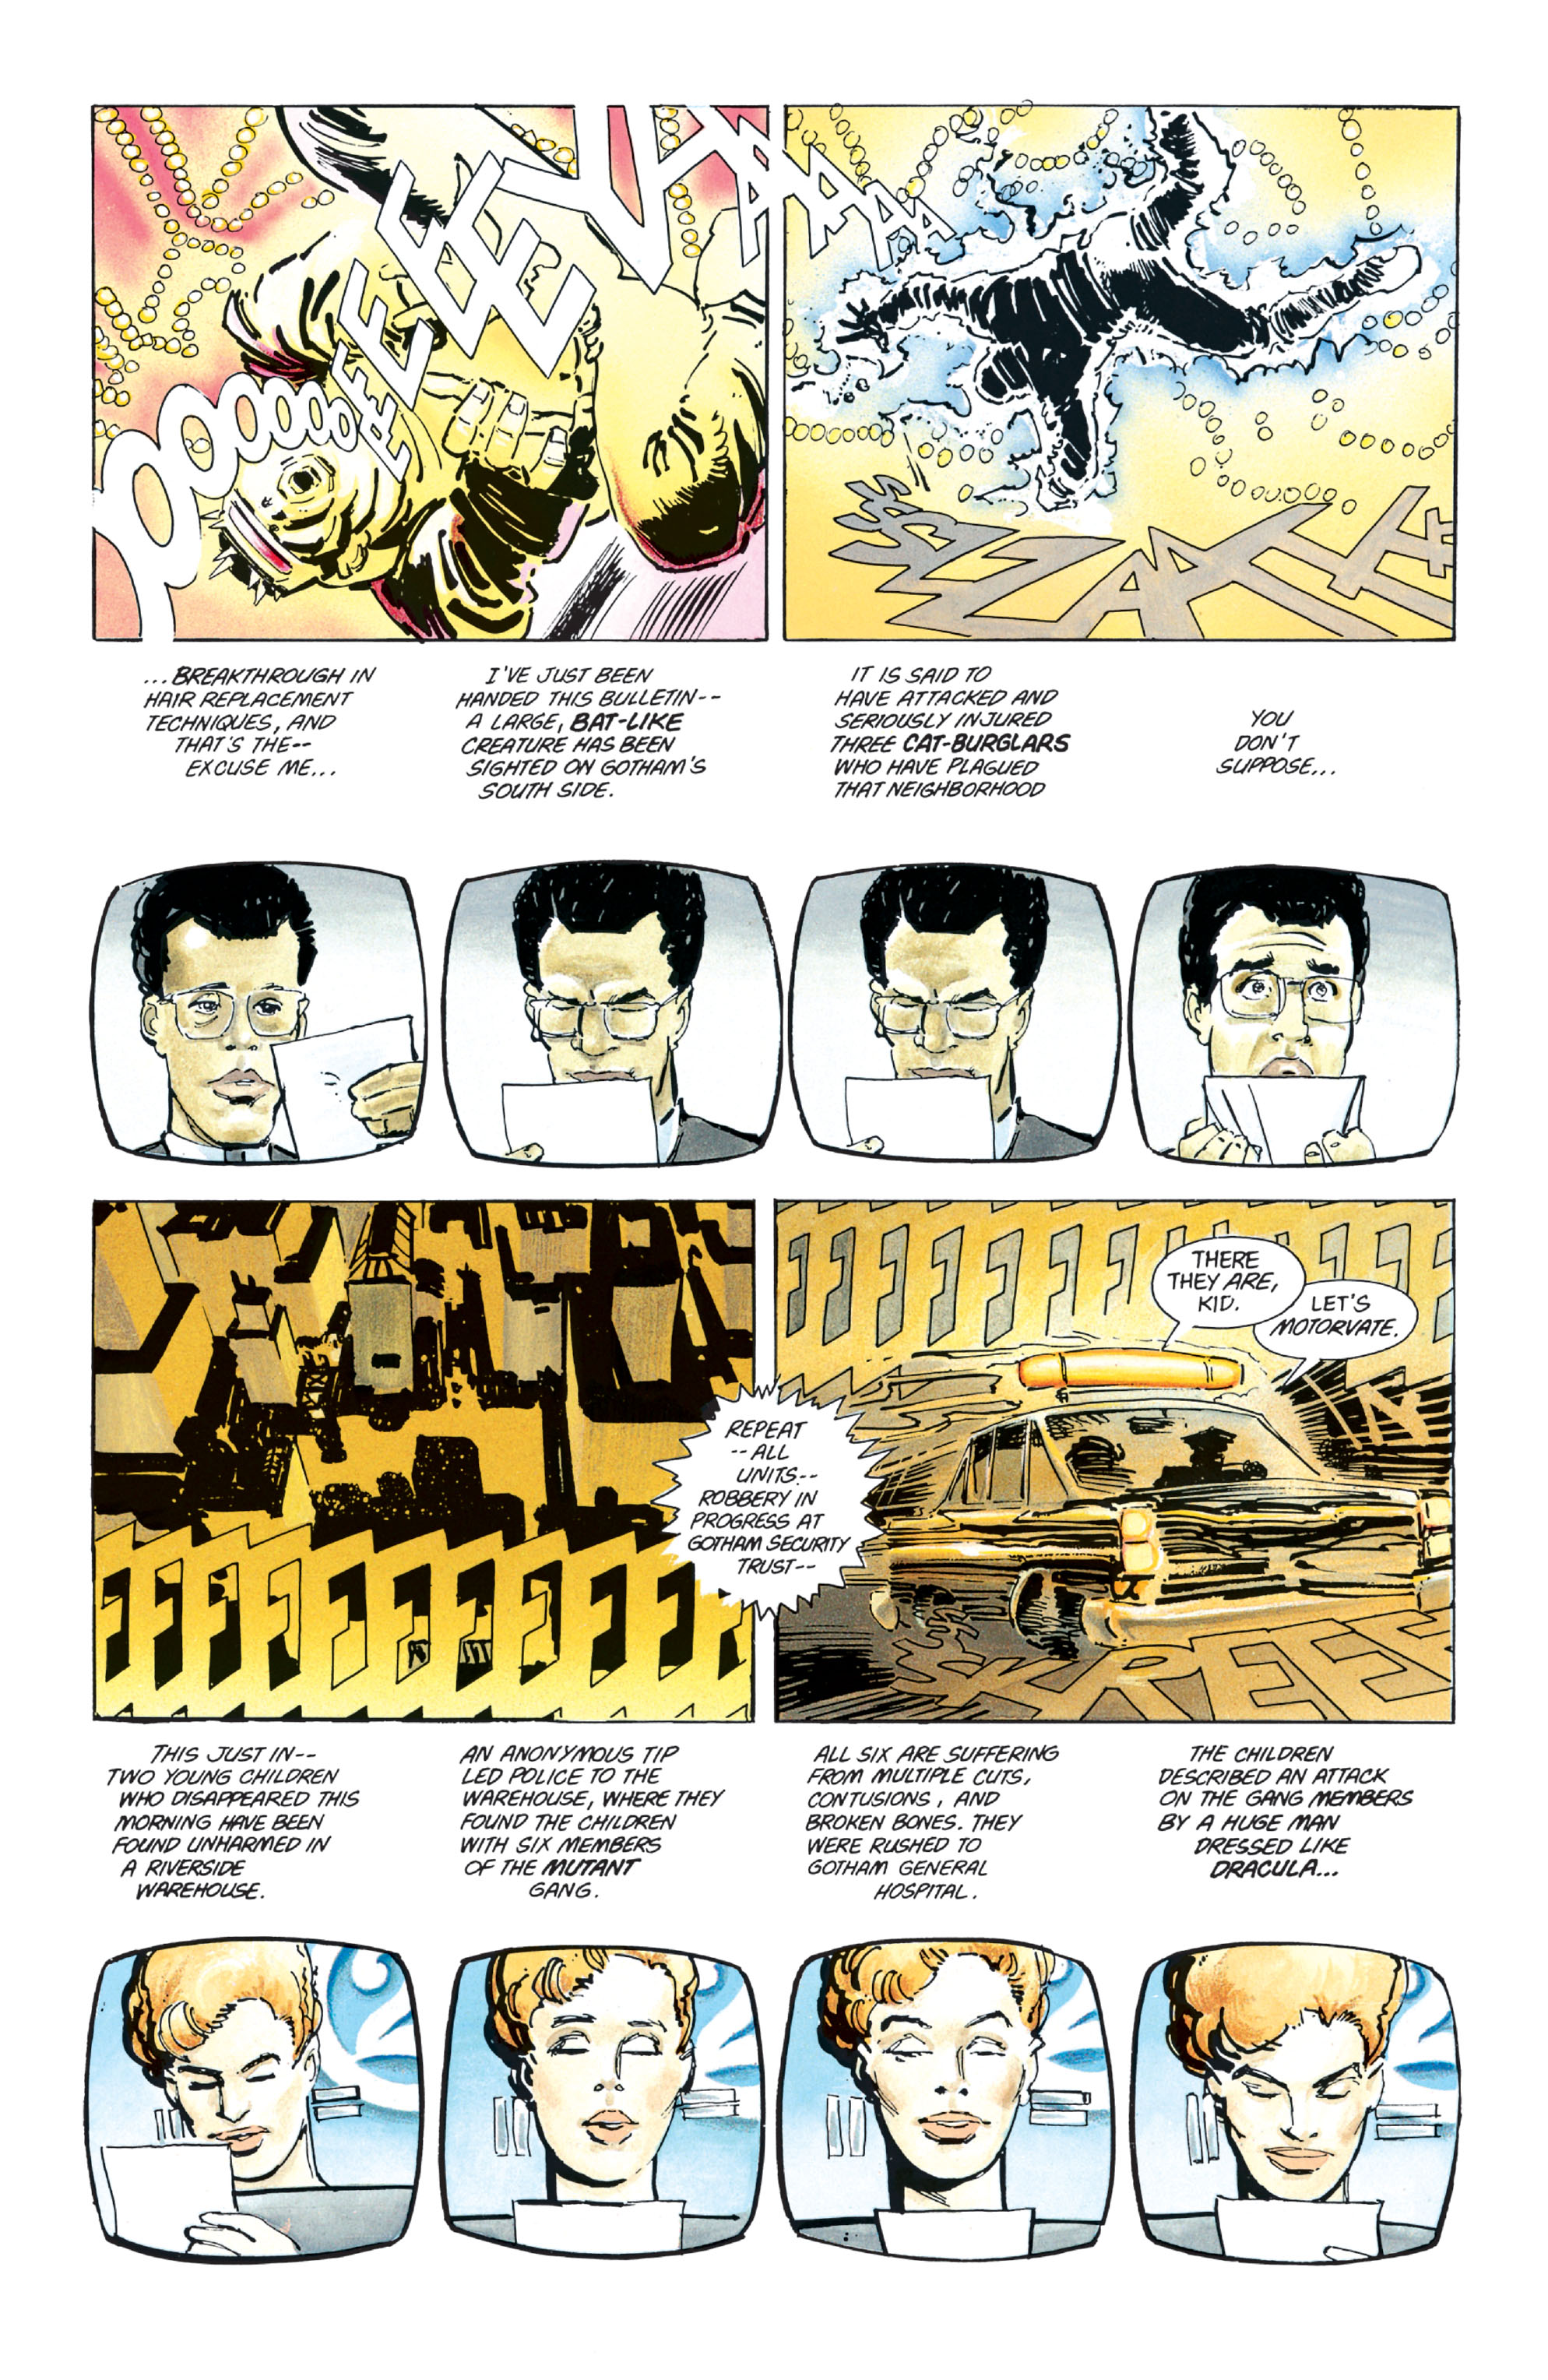 Psychology of Bruce Wayne Si6qsRaTd0QHw8Ap1y_m7SzZVKqrWoit-HSwpDfeWHjMV0U5lHyDjMTYoDRk-NzZ5C2SgTbKwZwC=s0